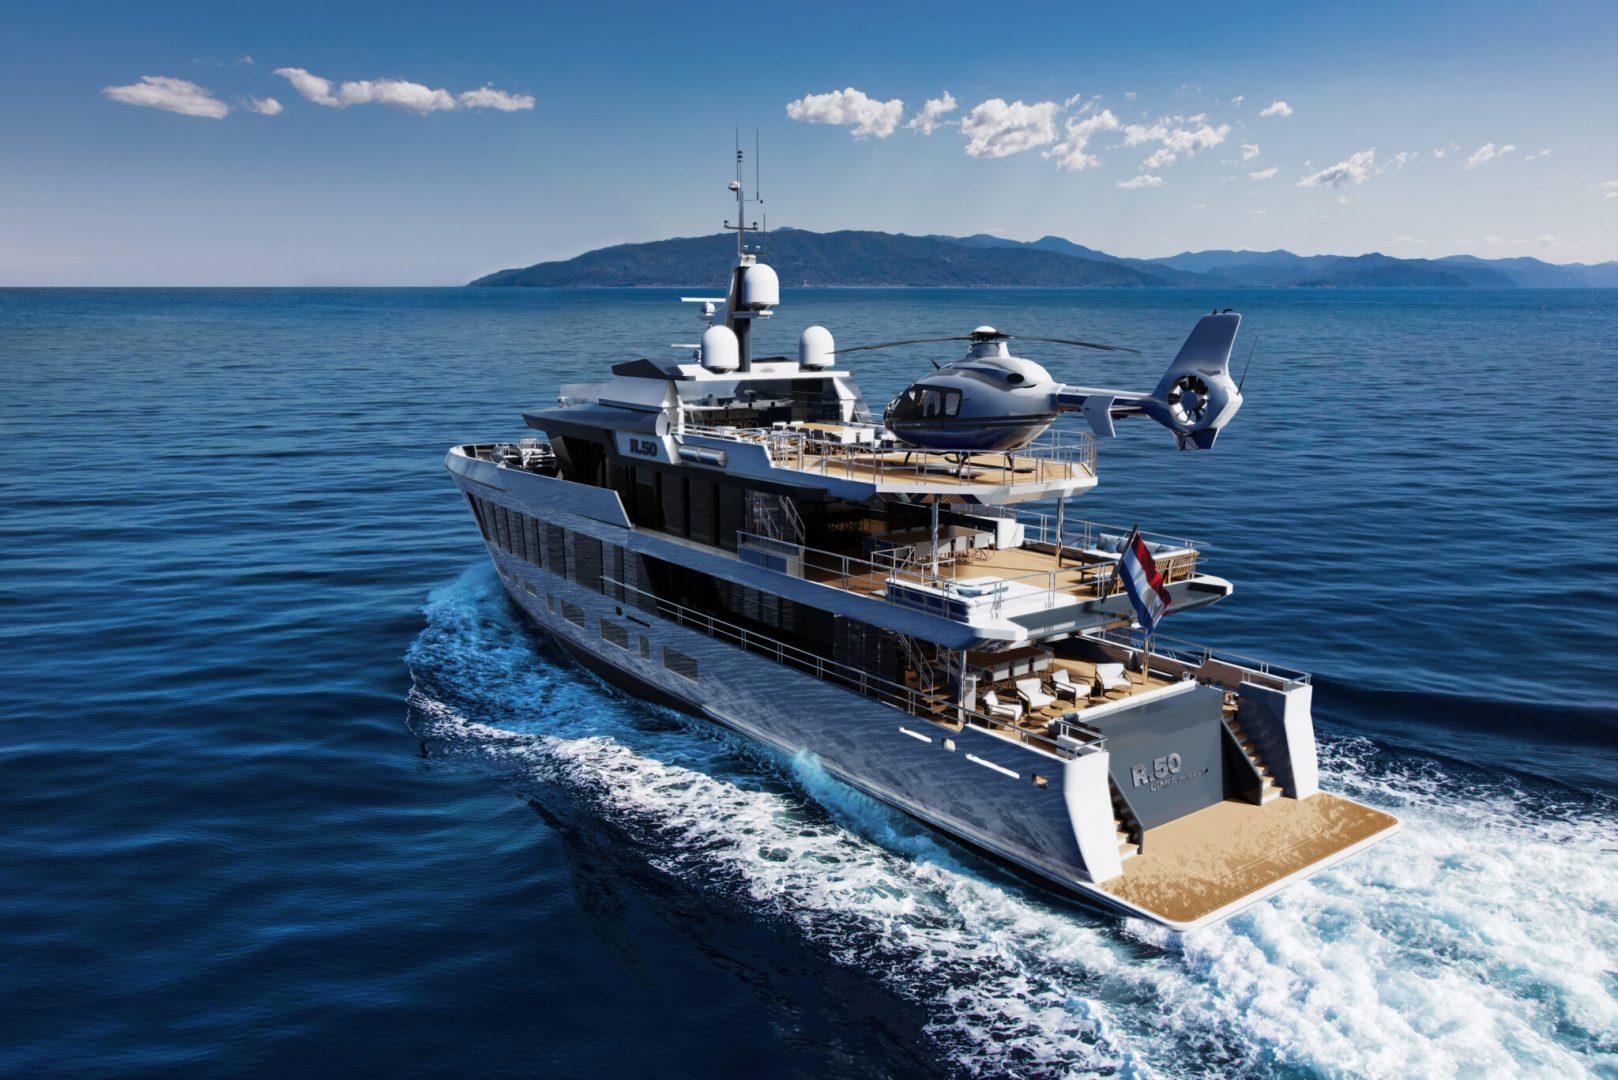 DIANA R.50 - 47-meter superyacht concept - Diana Yacht Design